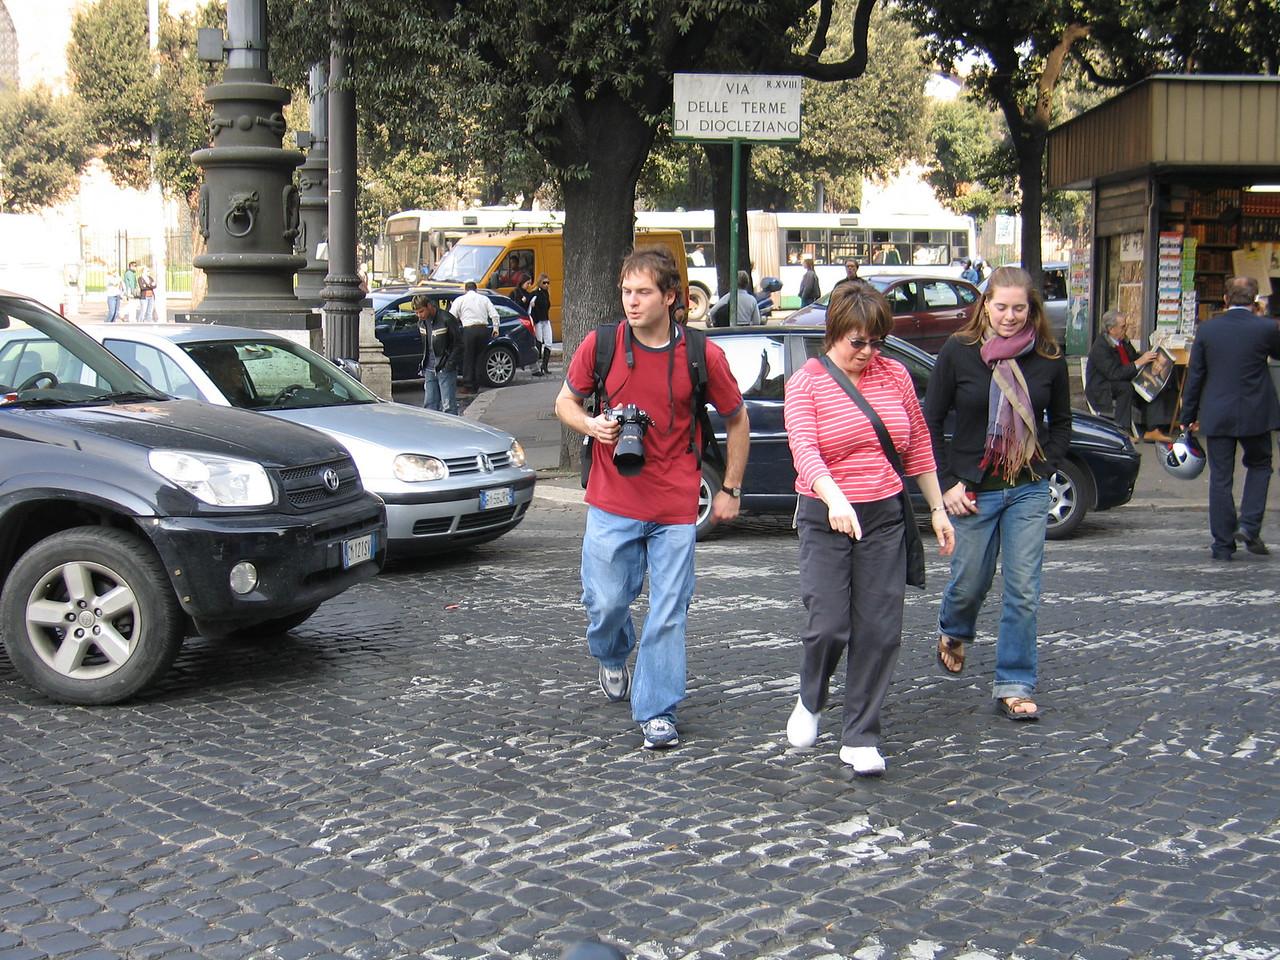 Jon, Pat & Cheryl crossing the street.